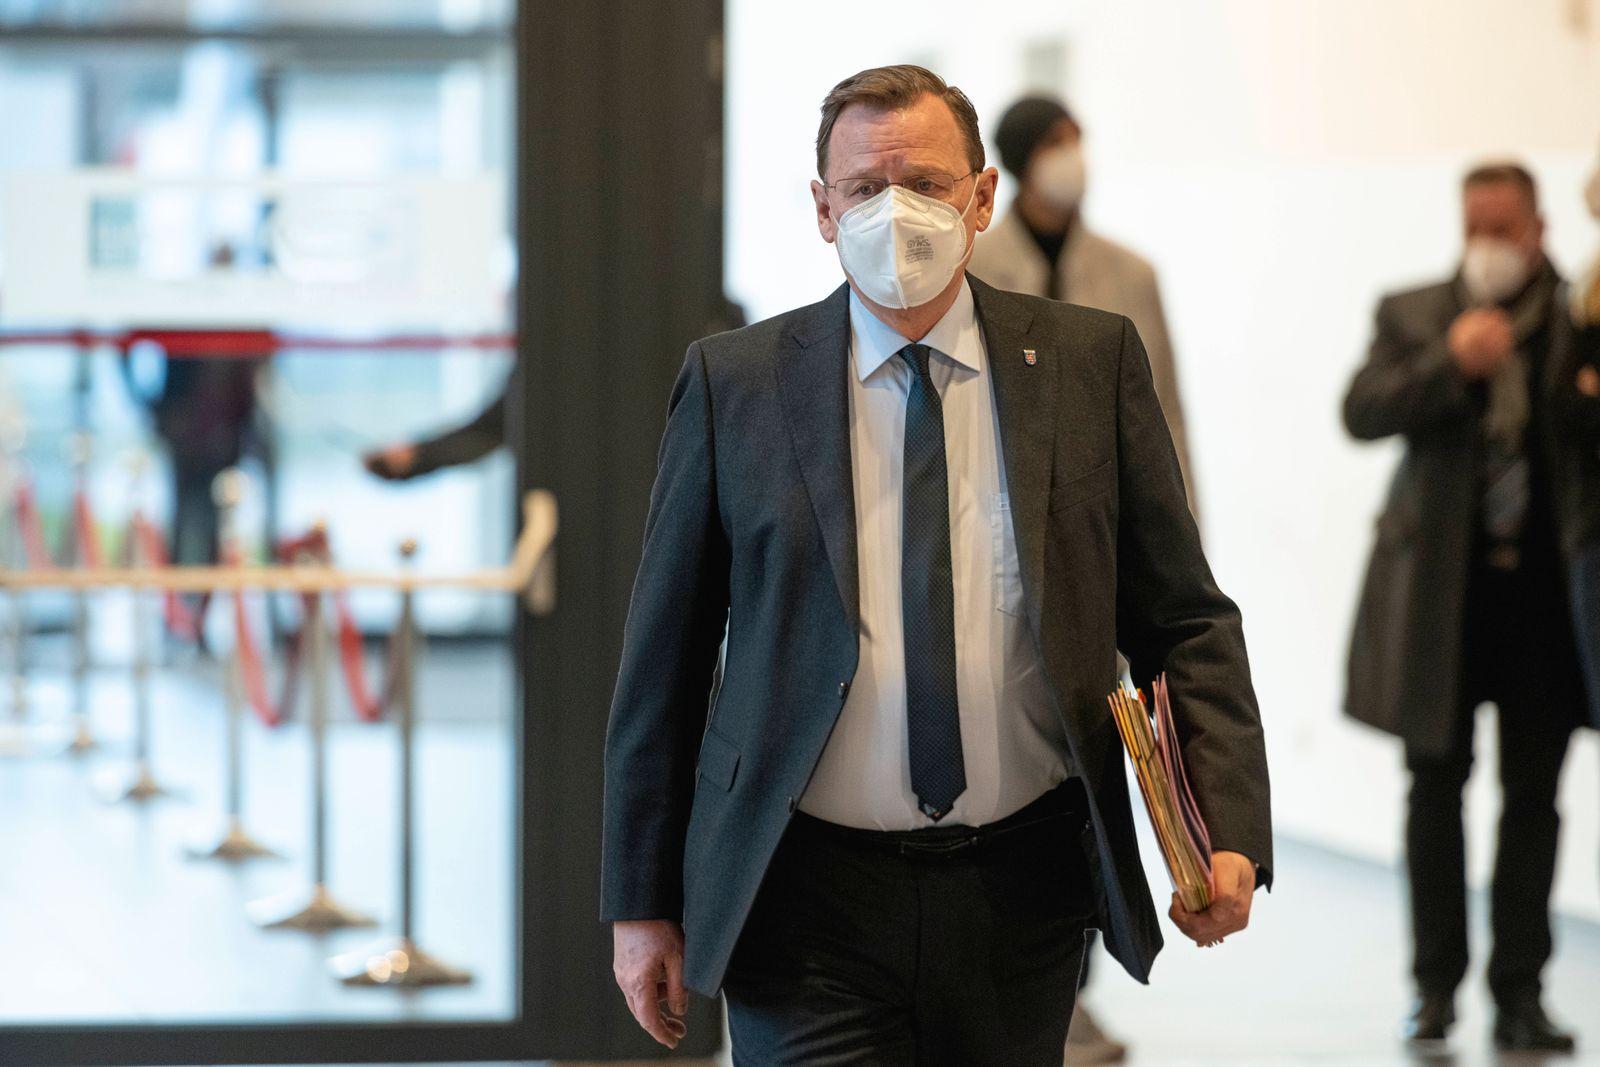 32. PLENARSITZUNG IM THÜRINGER LANDTAG 21/12/2020 - Erfurt: Ministerpräsident Bodo Ramelow (DIE LINKE) kommt zur 32. Pl